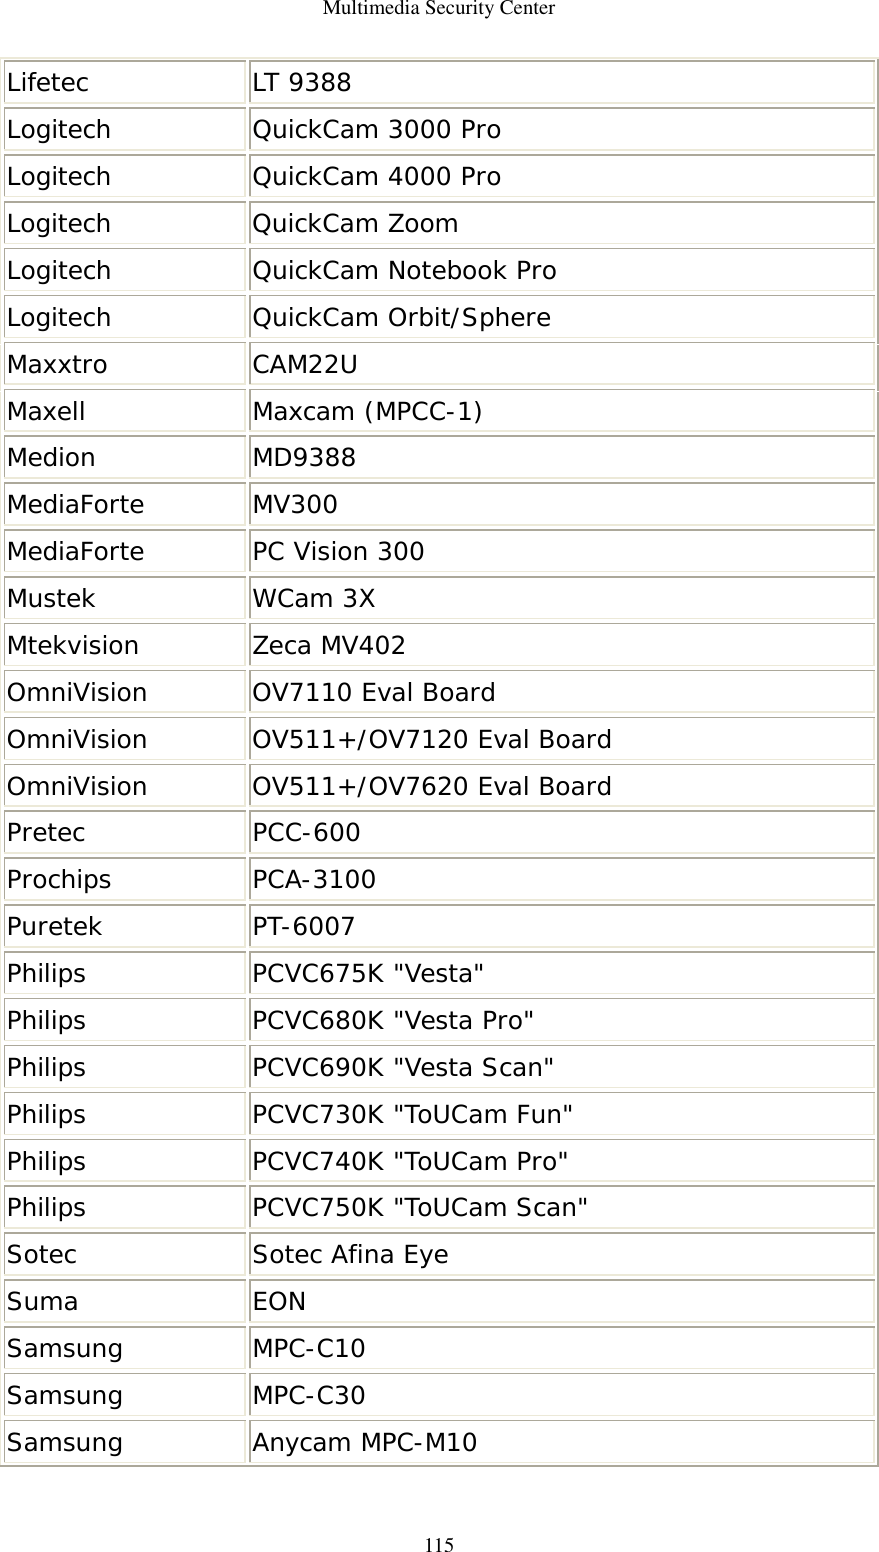 MAXELL MPCC 1 WINDOWS 8.1 DRIVER DOWNLOAD